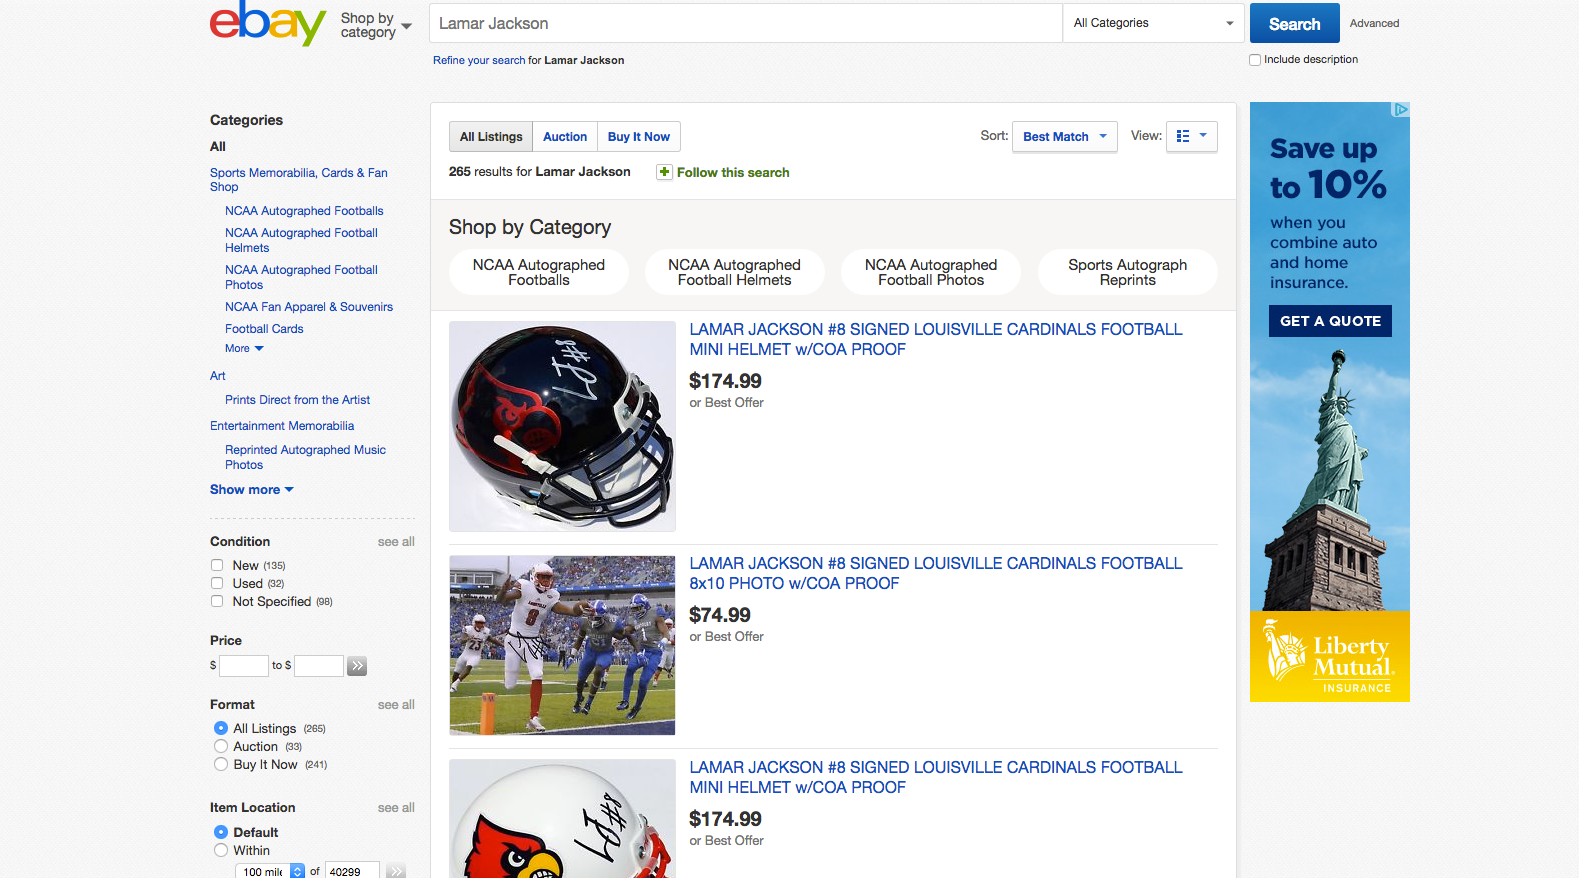 eBay screen shot